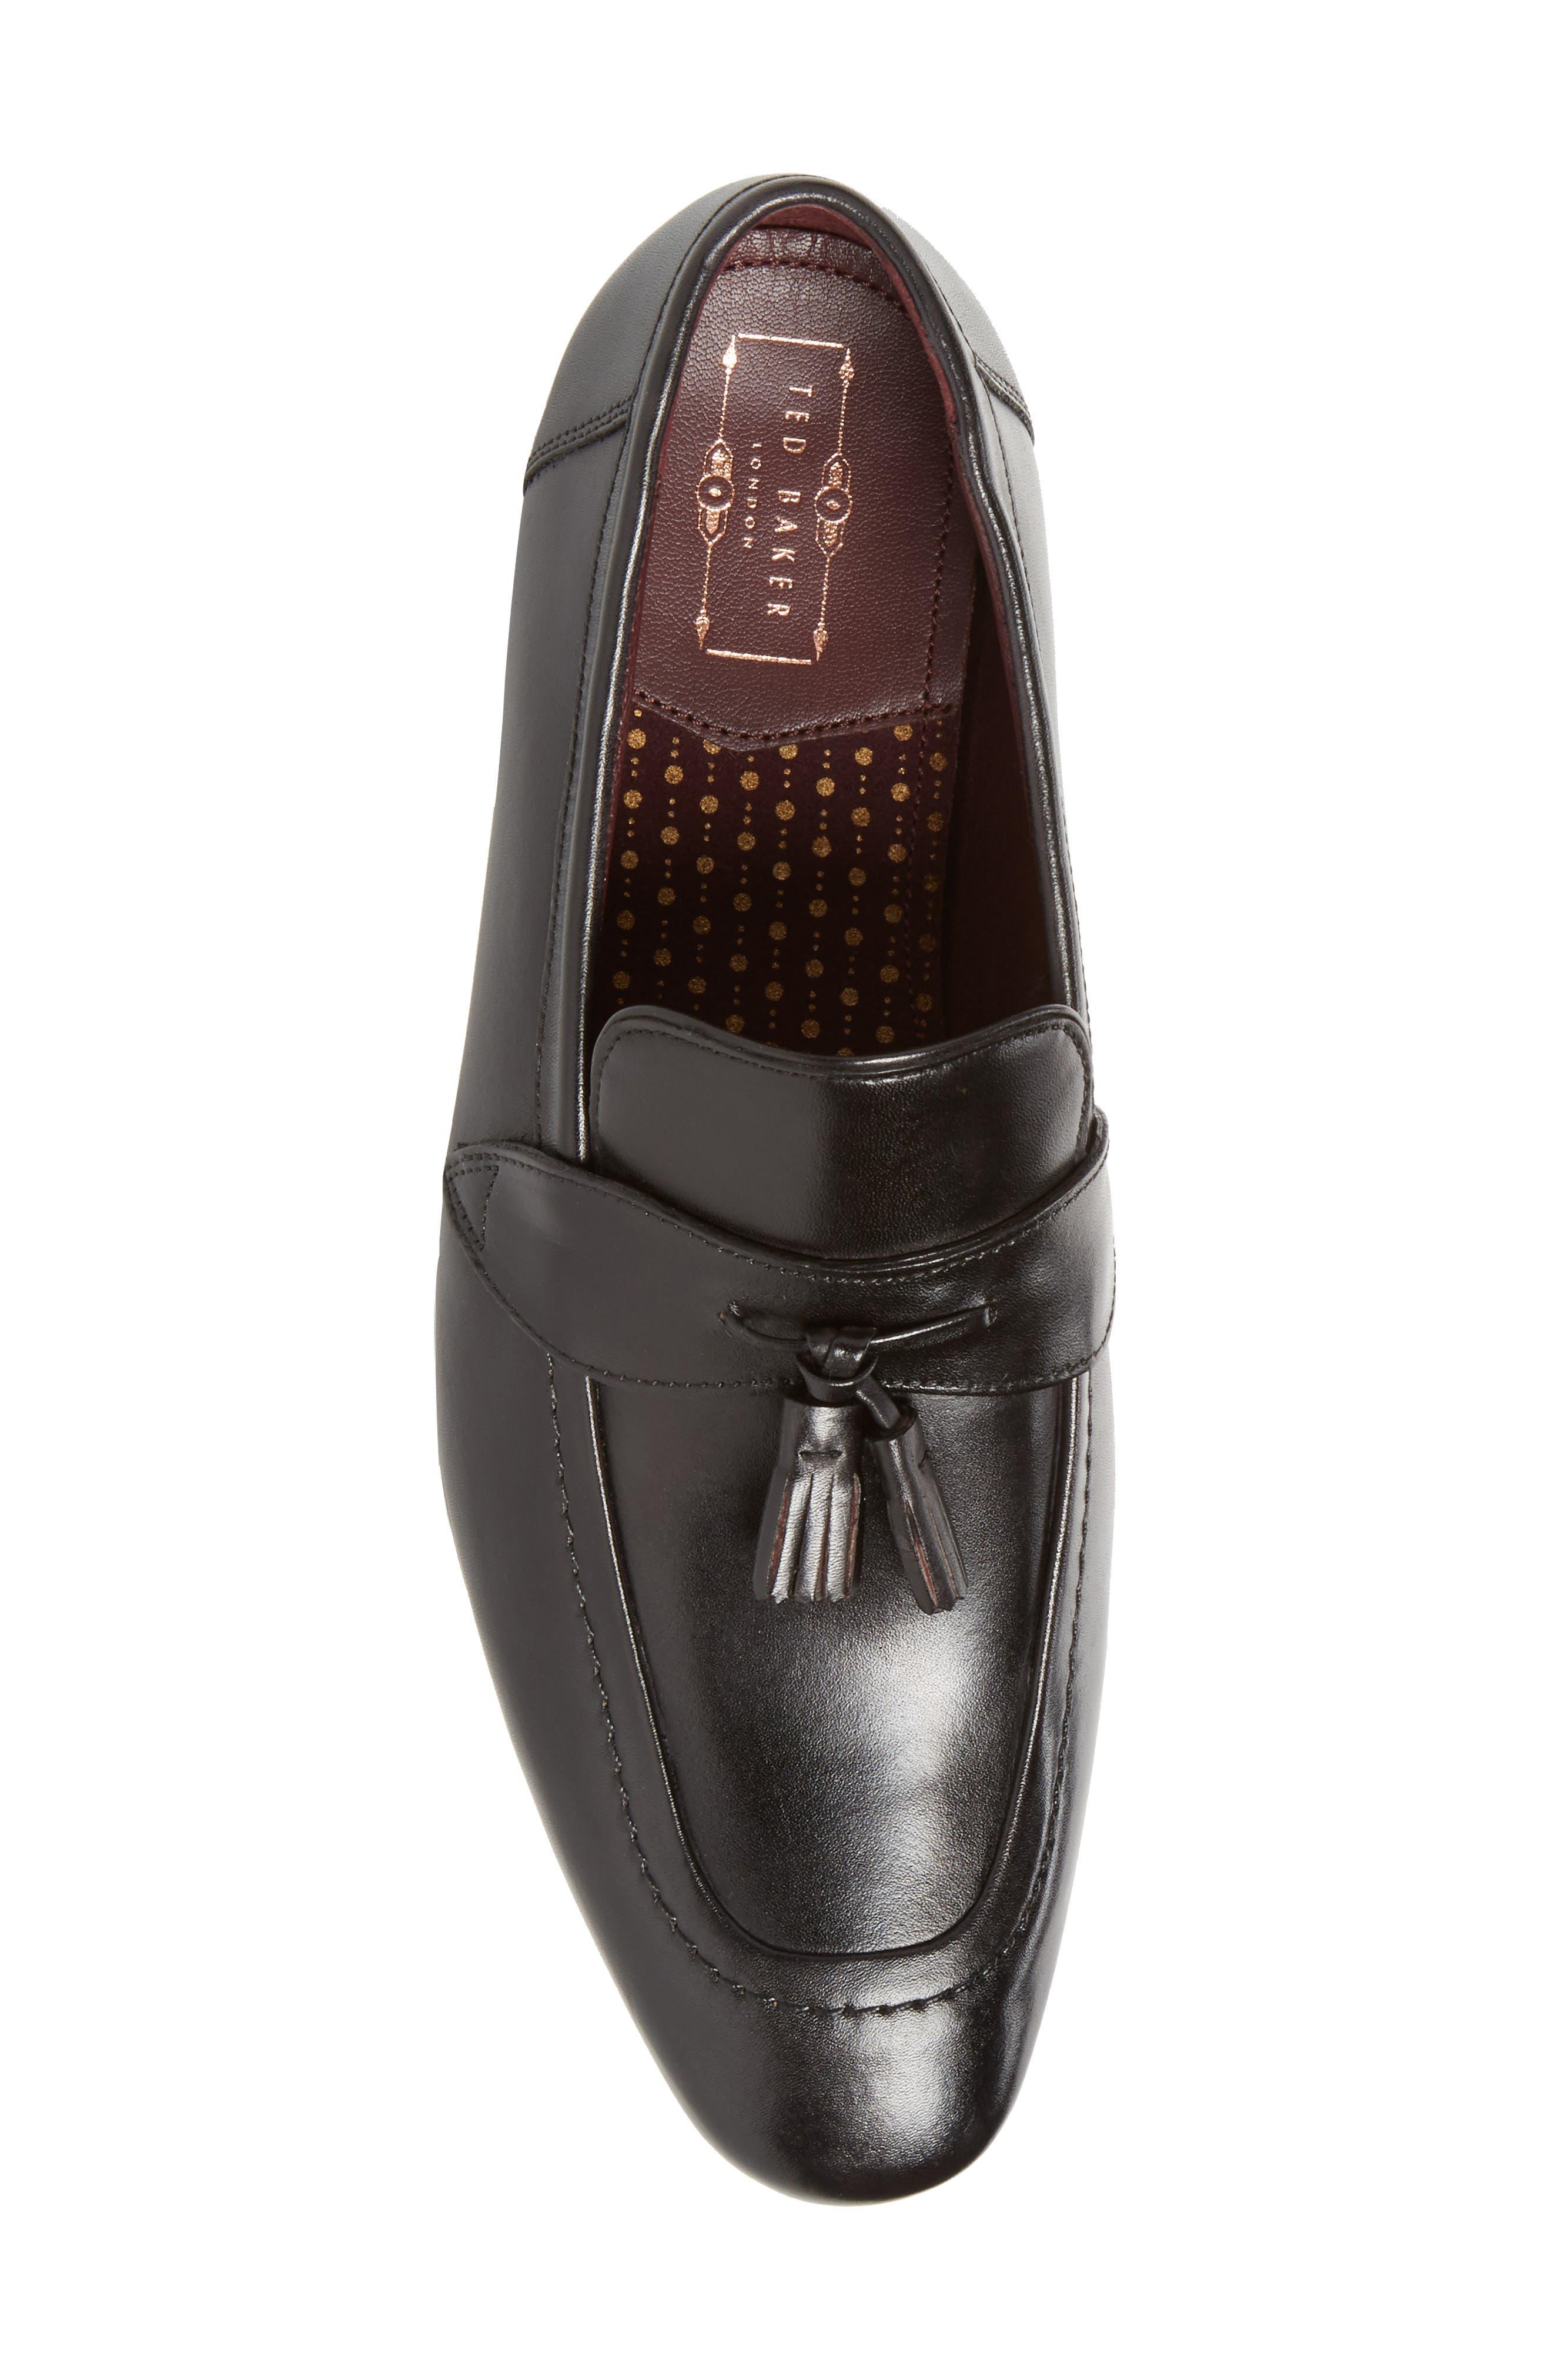 Grafit Tassel Loafer,                             Alternate thumbnail 3, color,                             Black Leather